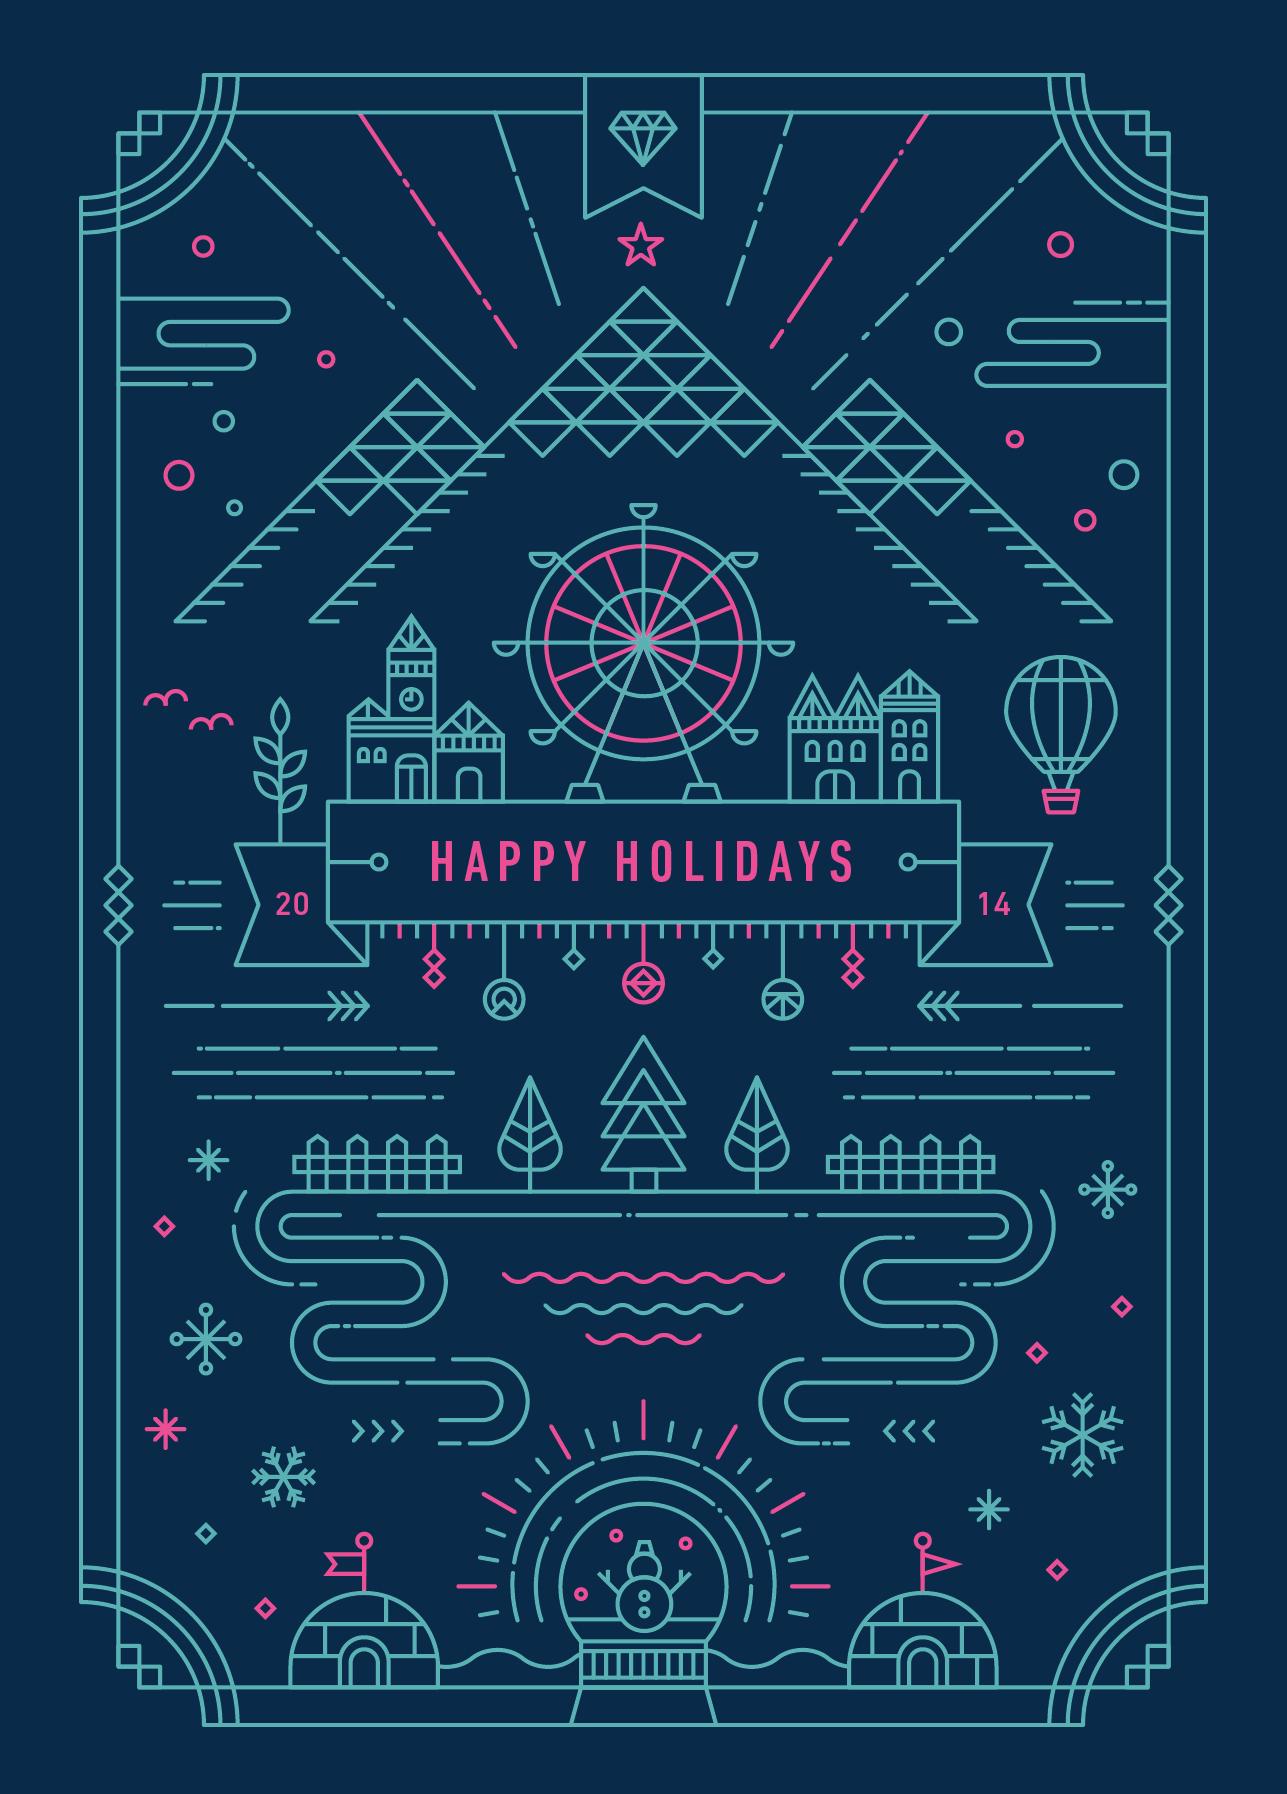 Yiwen_lu-holiday_card-2014-cover | Illustration | Pinterest ...